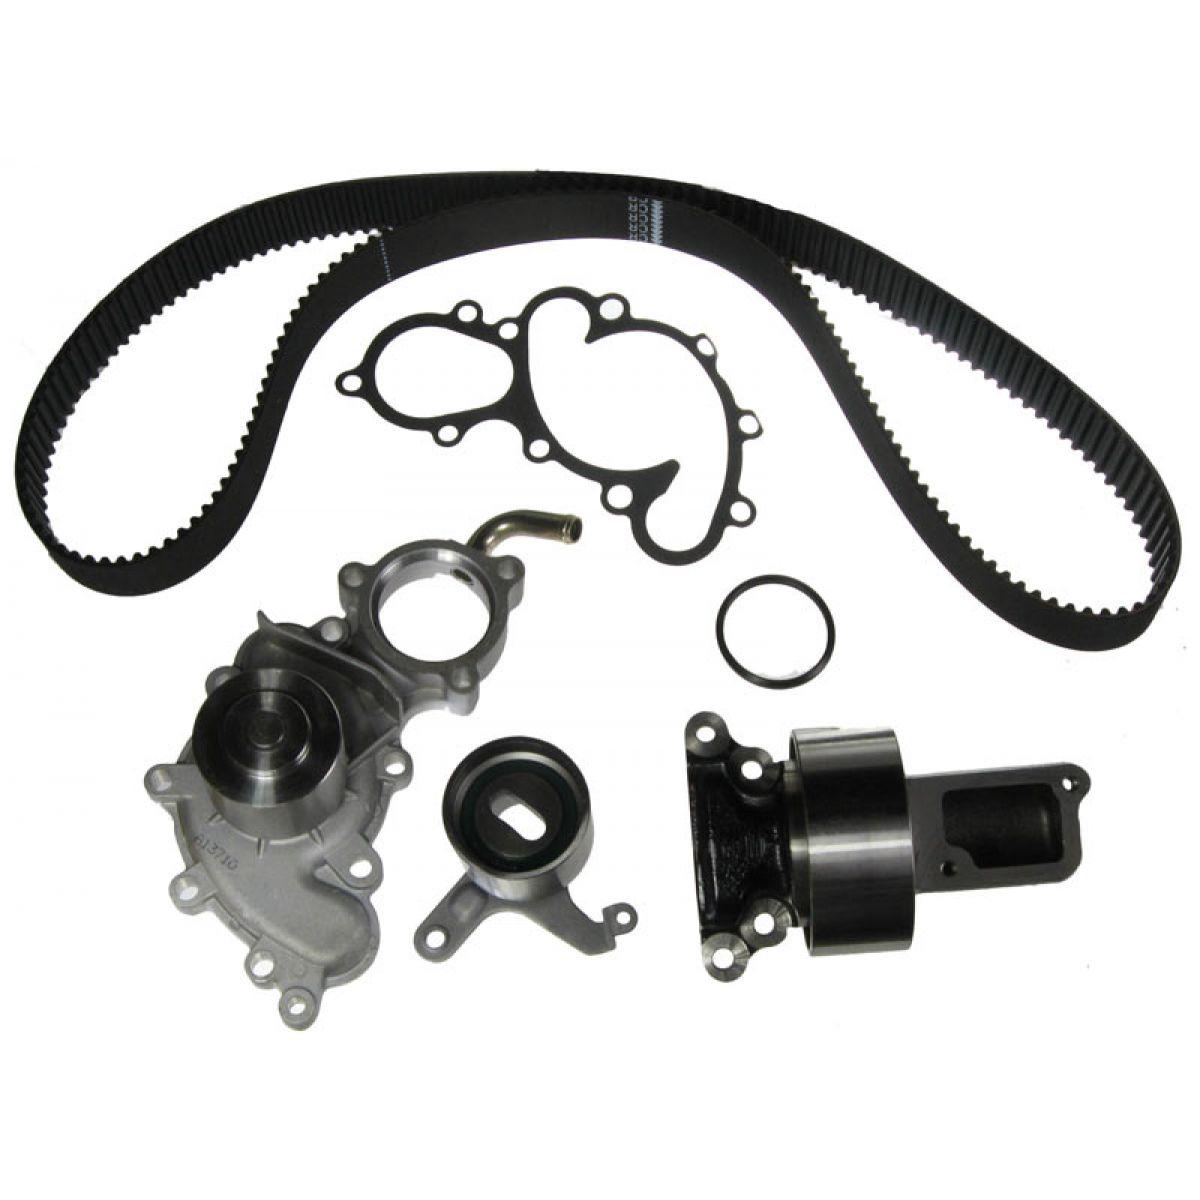 Timing Belt Kit w/ Water Pump GATES for 93 -95 Toyota Pickup